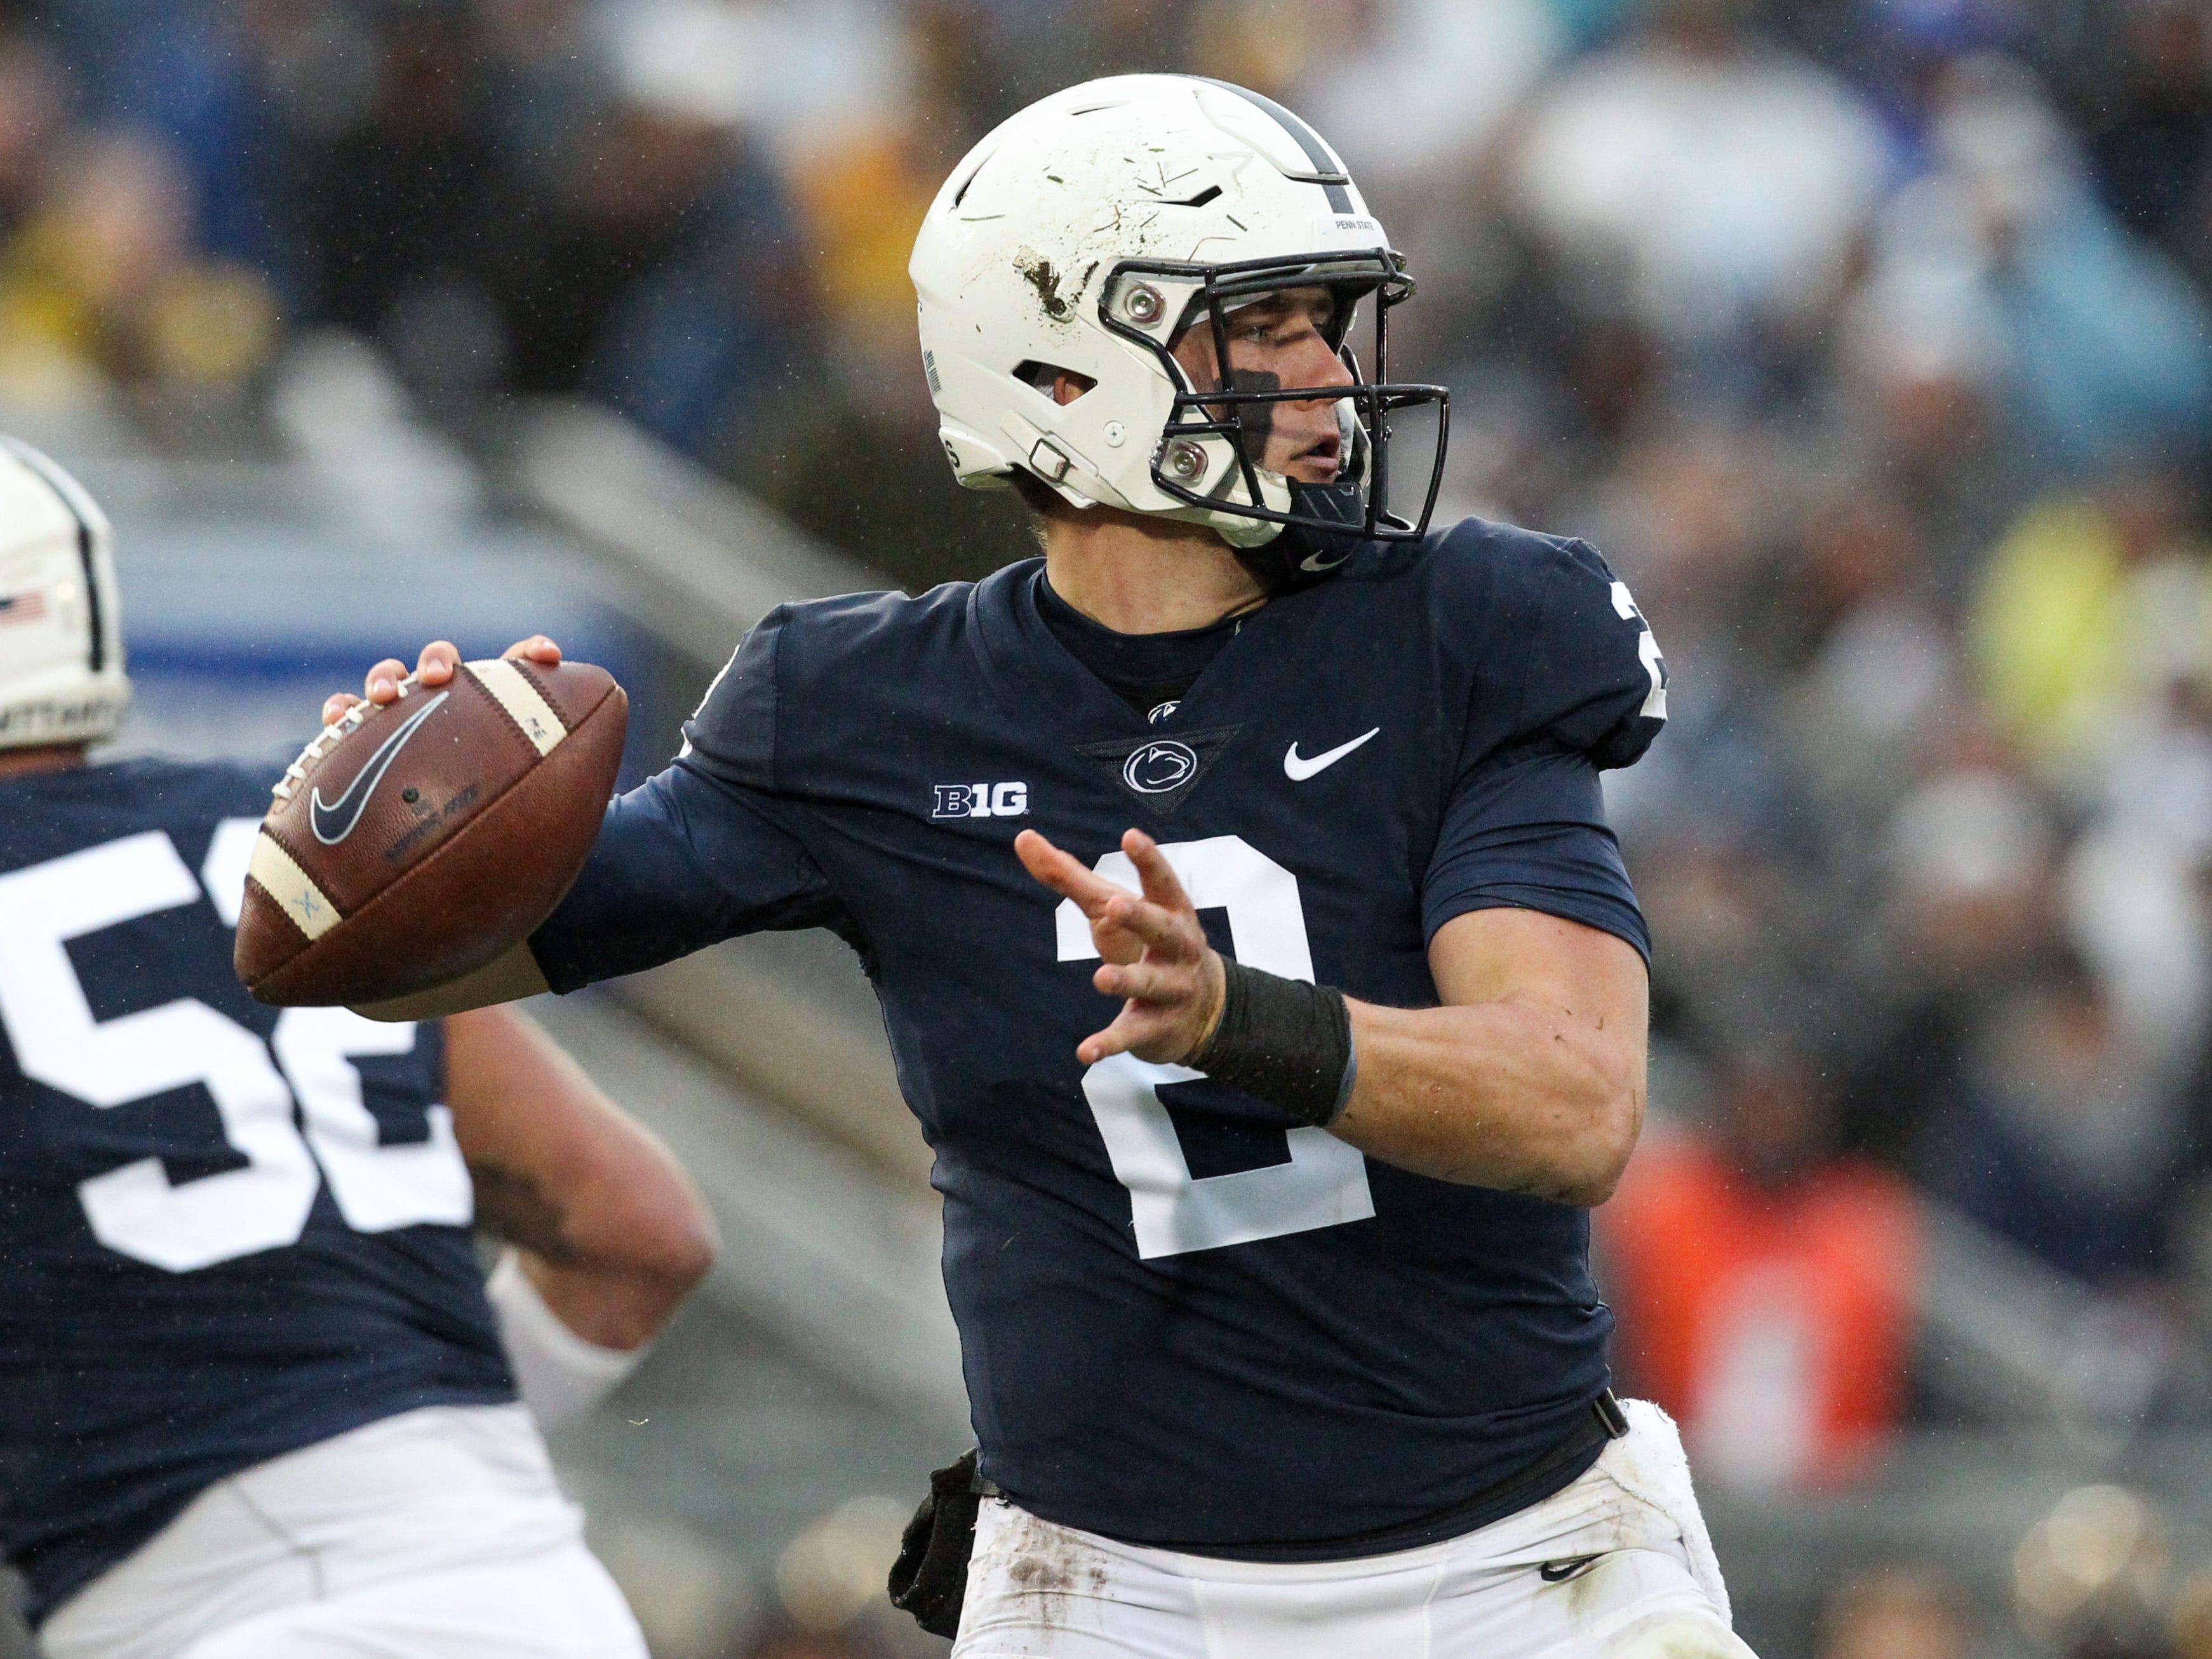 21. Penn State